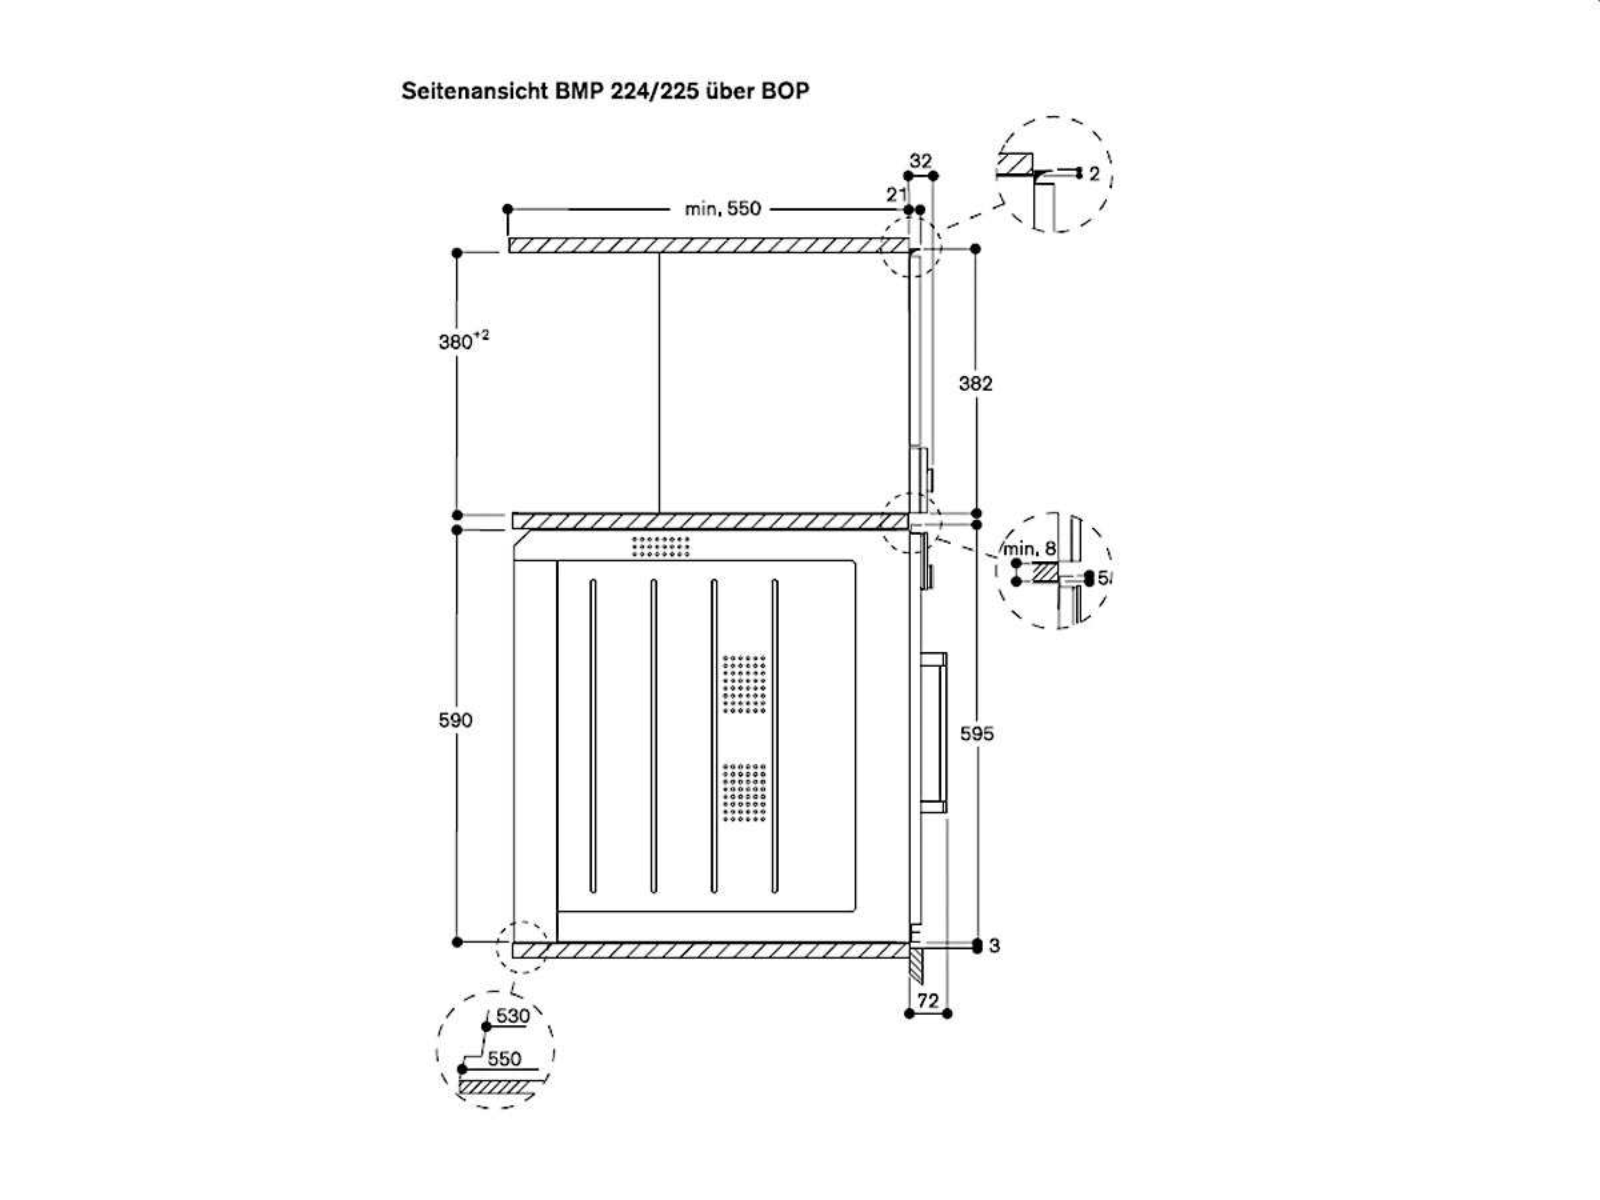 Gaggenau BMP 224 100 Einbau-Mikrowelle Serie 200 Anthrazit